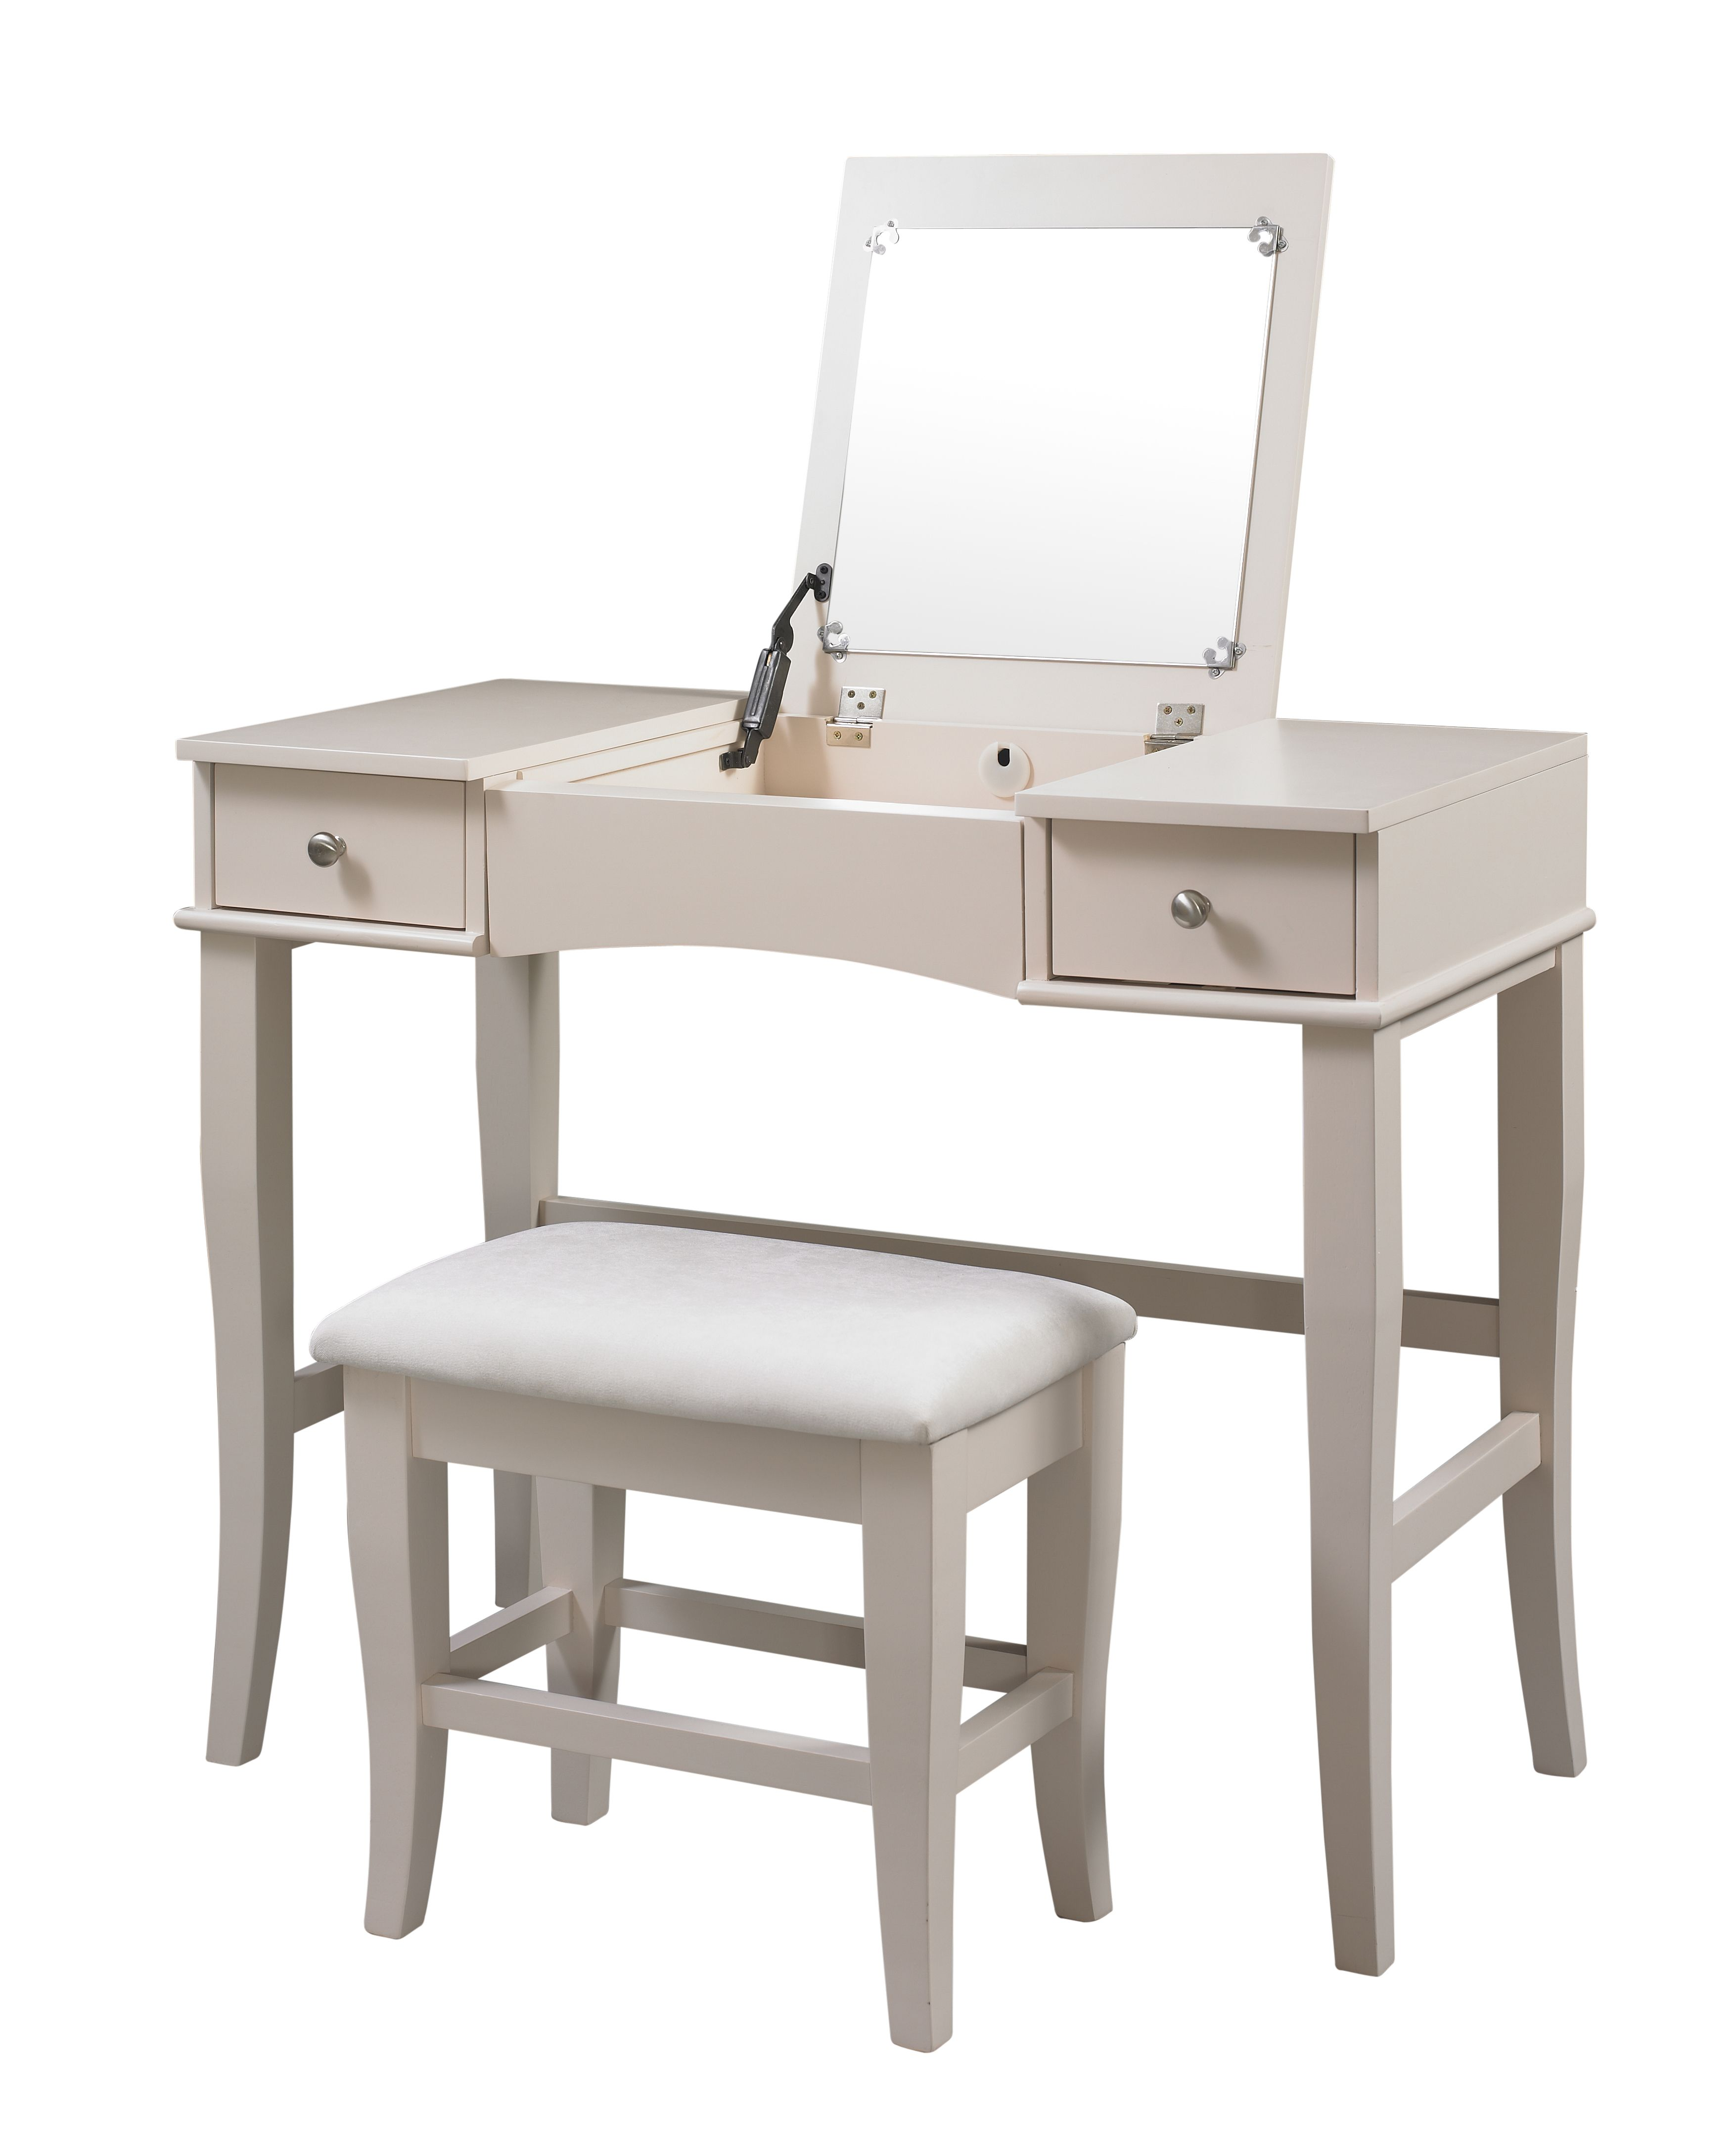 Linon Lattice Vanity Set Multiple Colors: Linon Jackson Vanity Set, Off-white